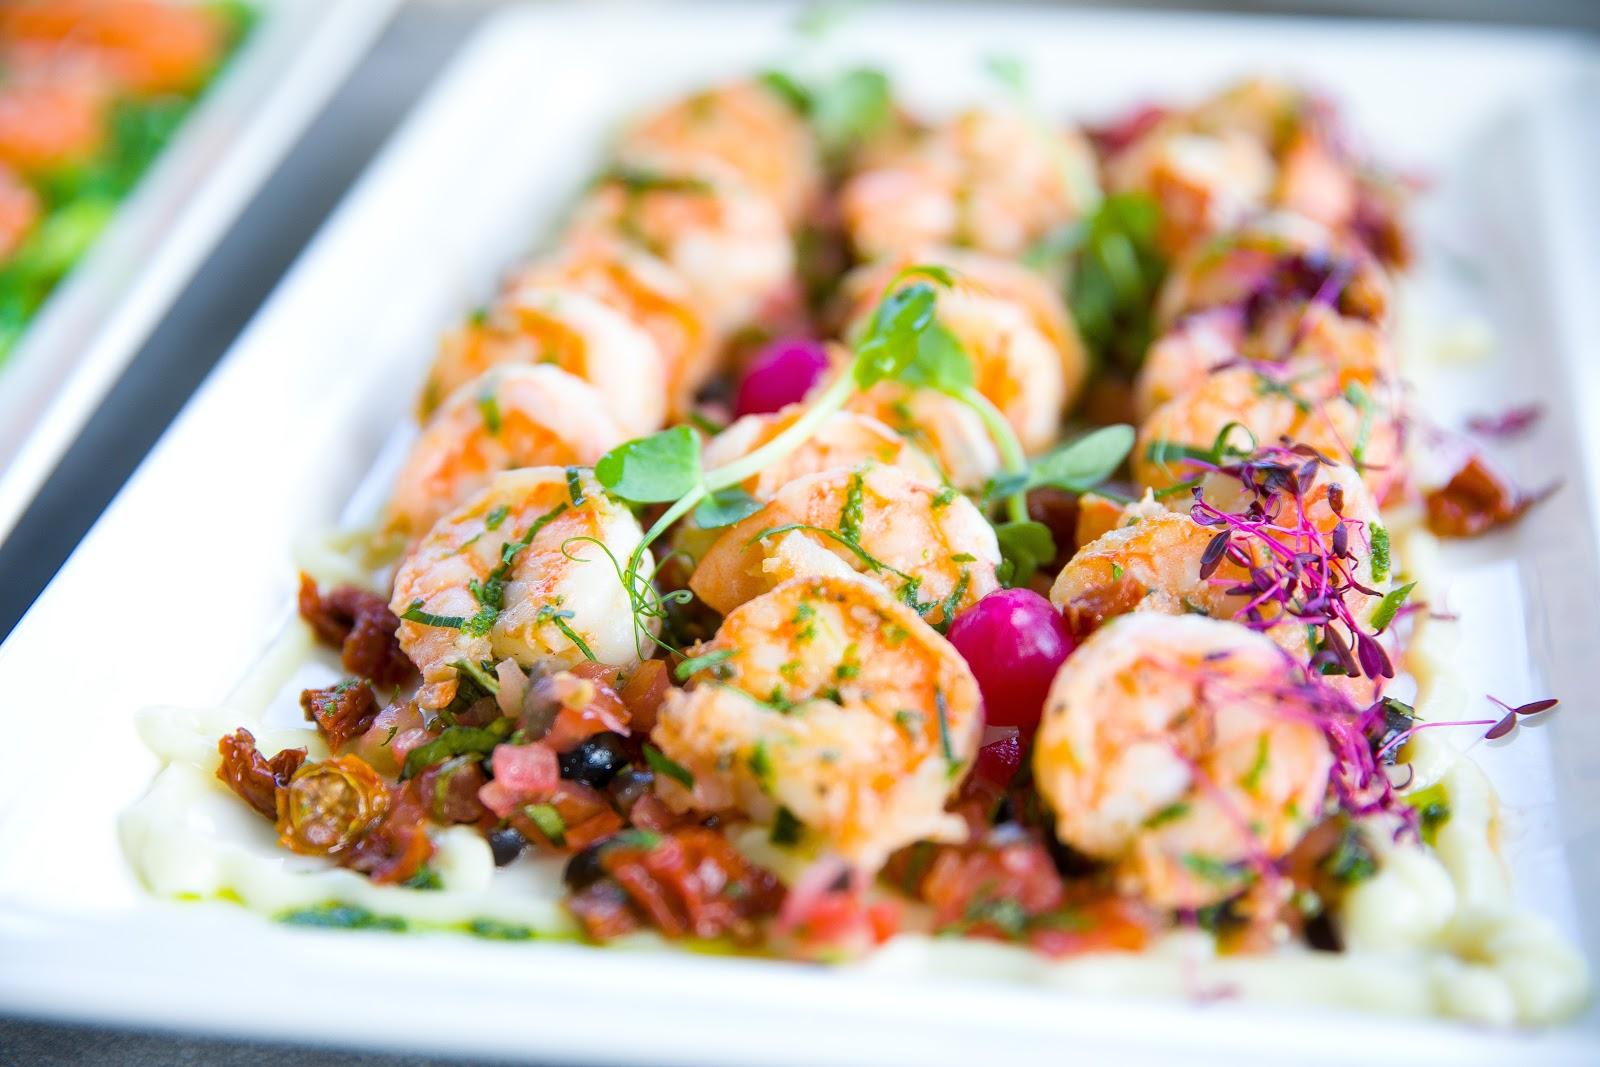 shrimp dish on a plate